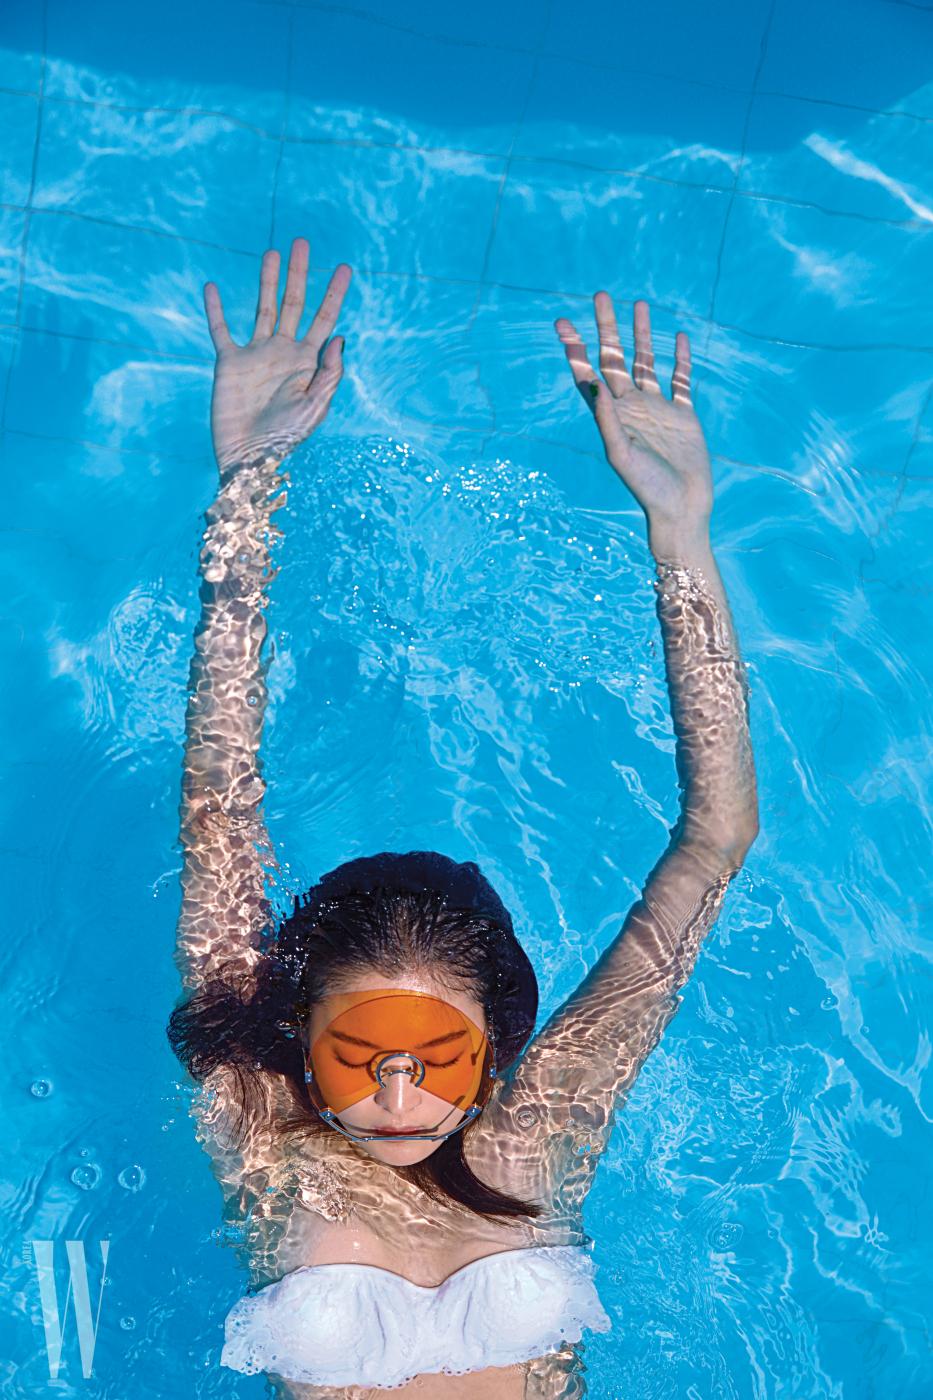 CD를 연상시키는 독특한 형태의 선글라스는 젠틀몬스터 제품. 가격 미정. 새하얀 아일릿 장식 수영복은 H&M 제품. 3만원대.